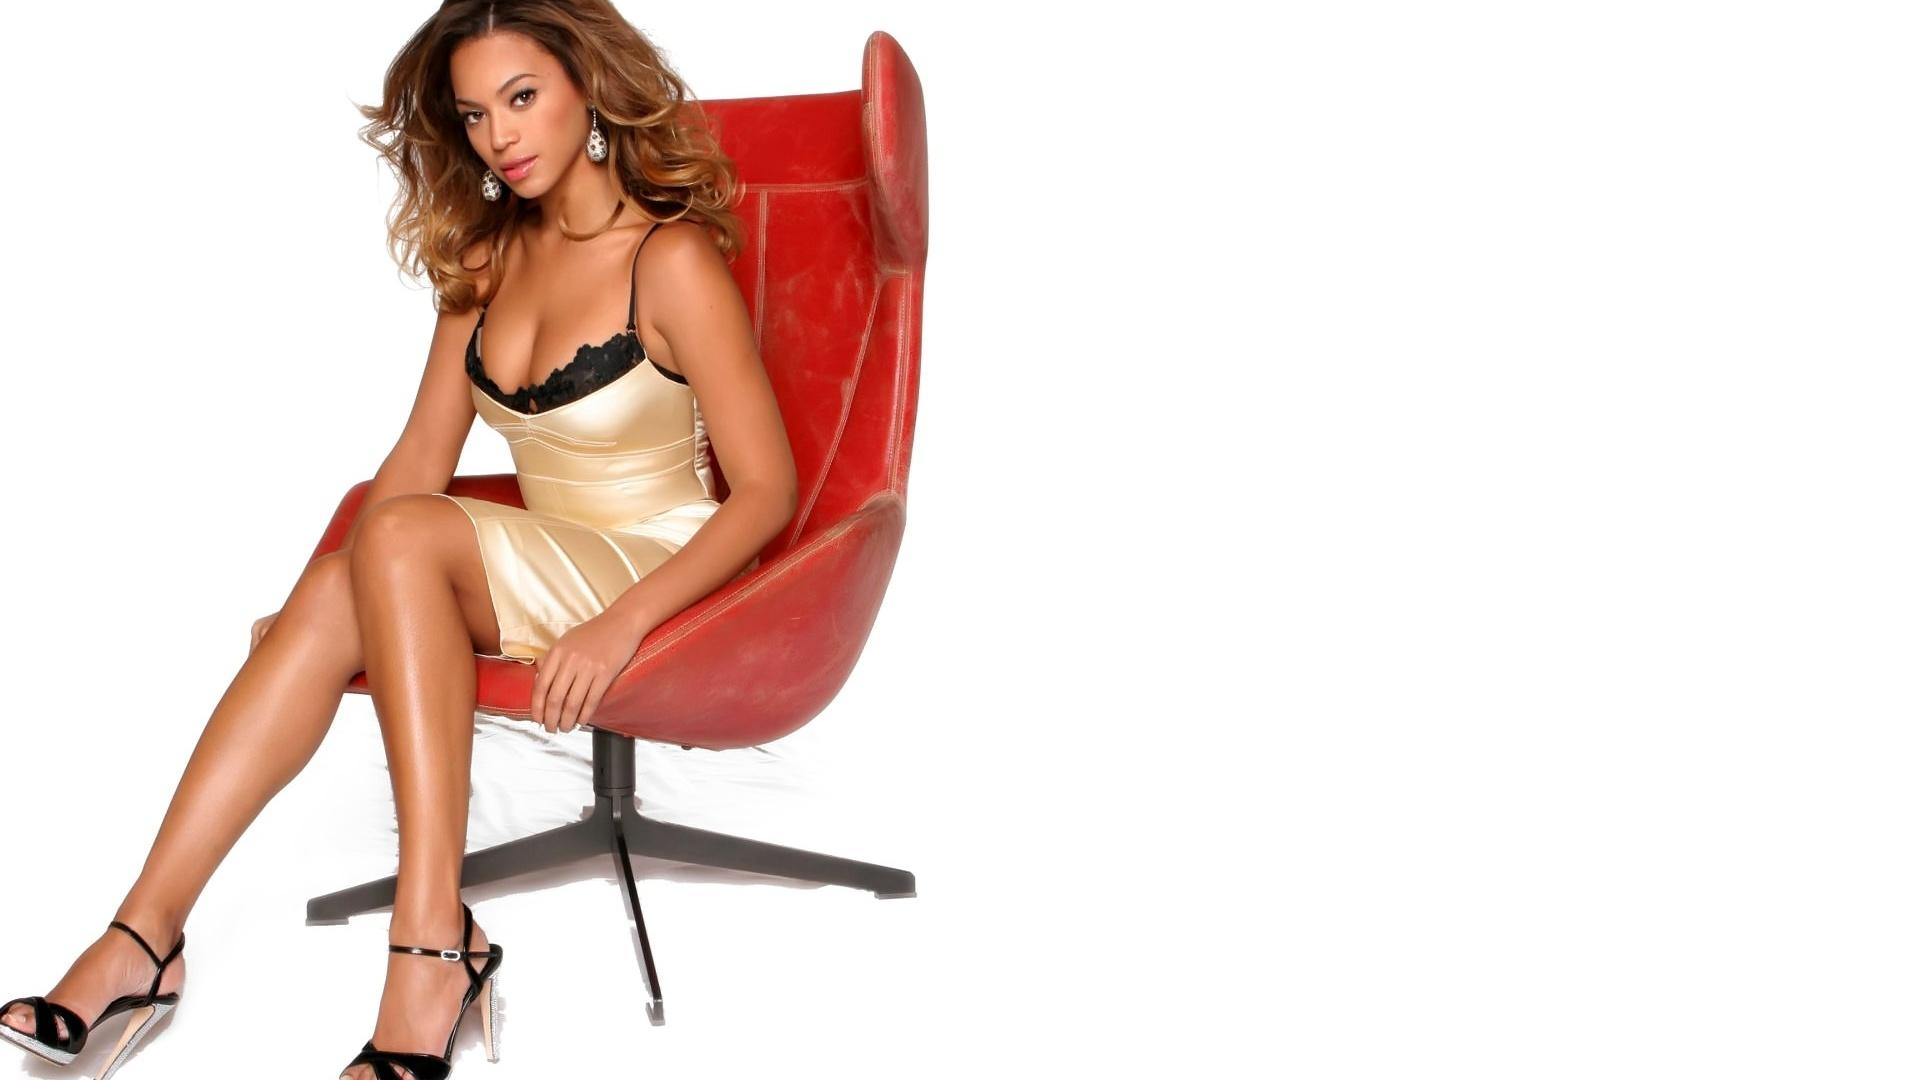 http://4.bp.blogspot.com/-G8SdYiZz67g/UDuR0CNixpI/AAAAAAAAEIQ/_U3o35jjAXs/s1920/Beyonce_Knowles_red_white1080.jpg